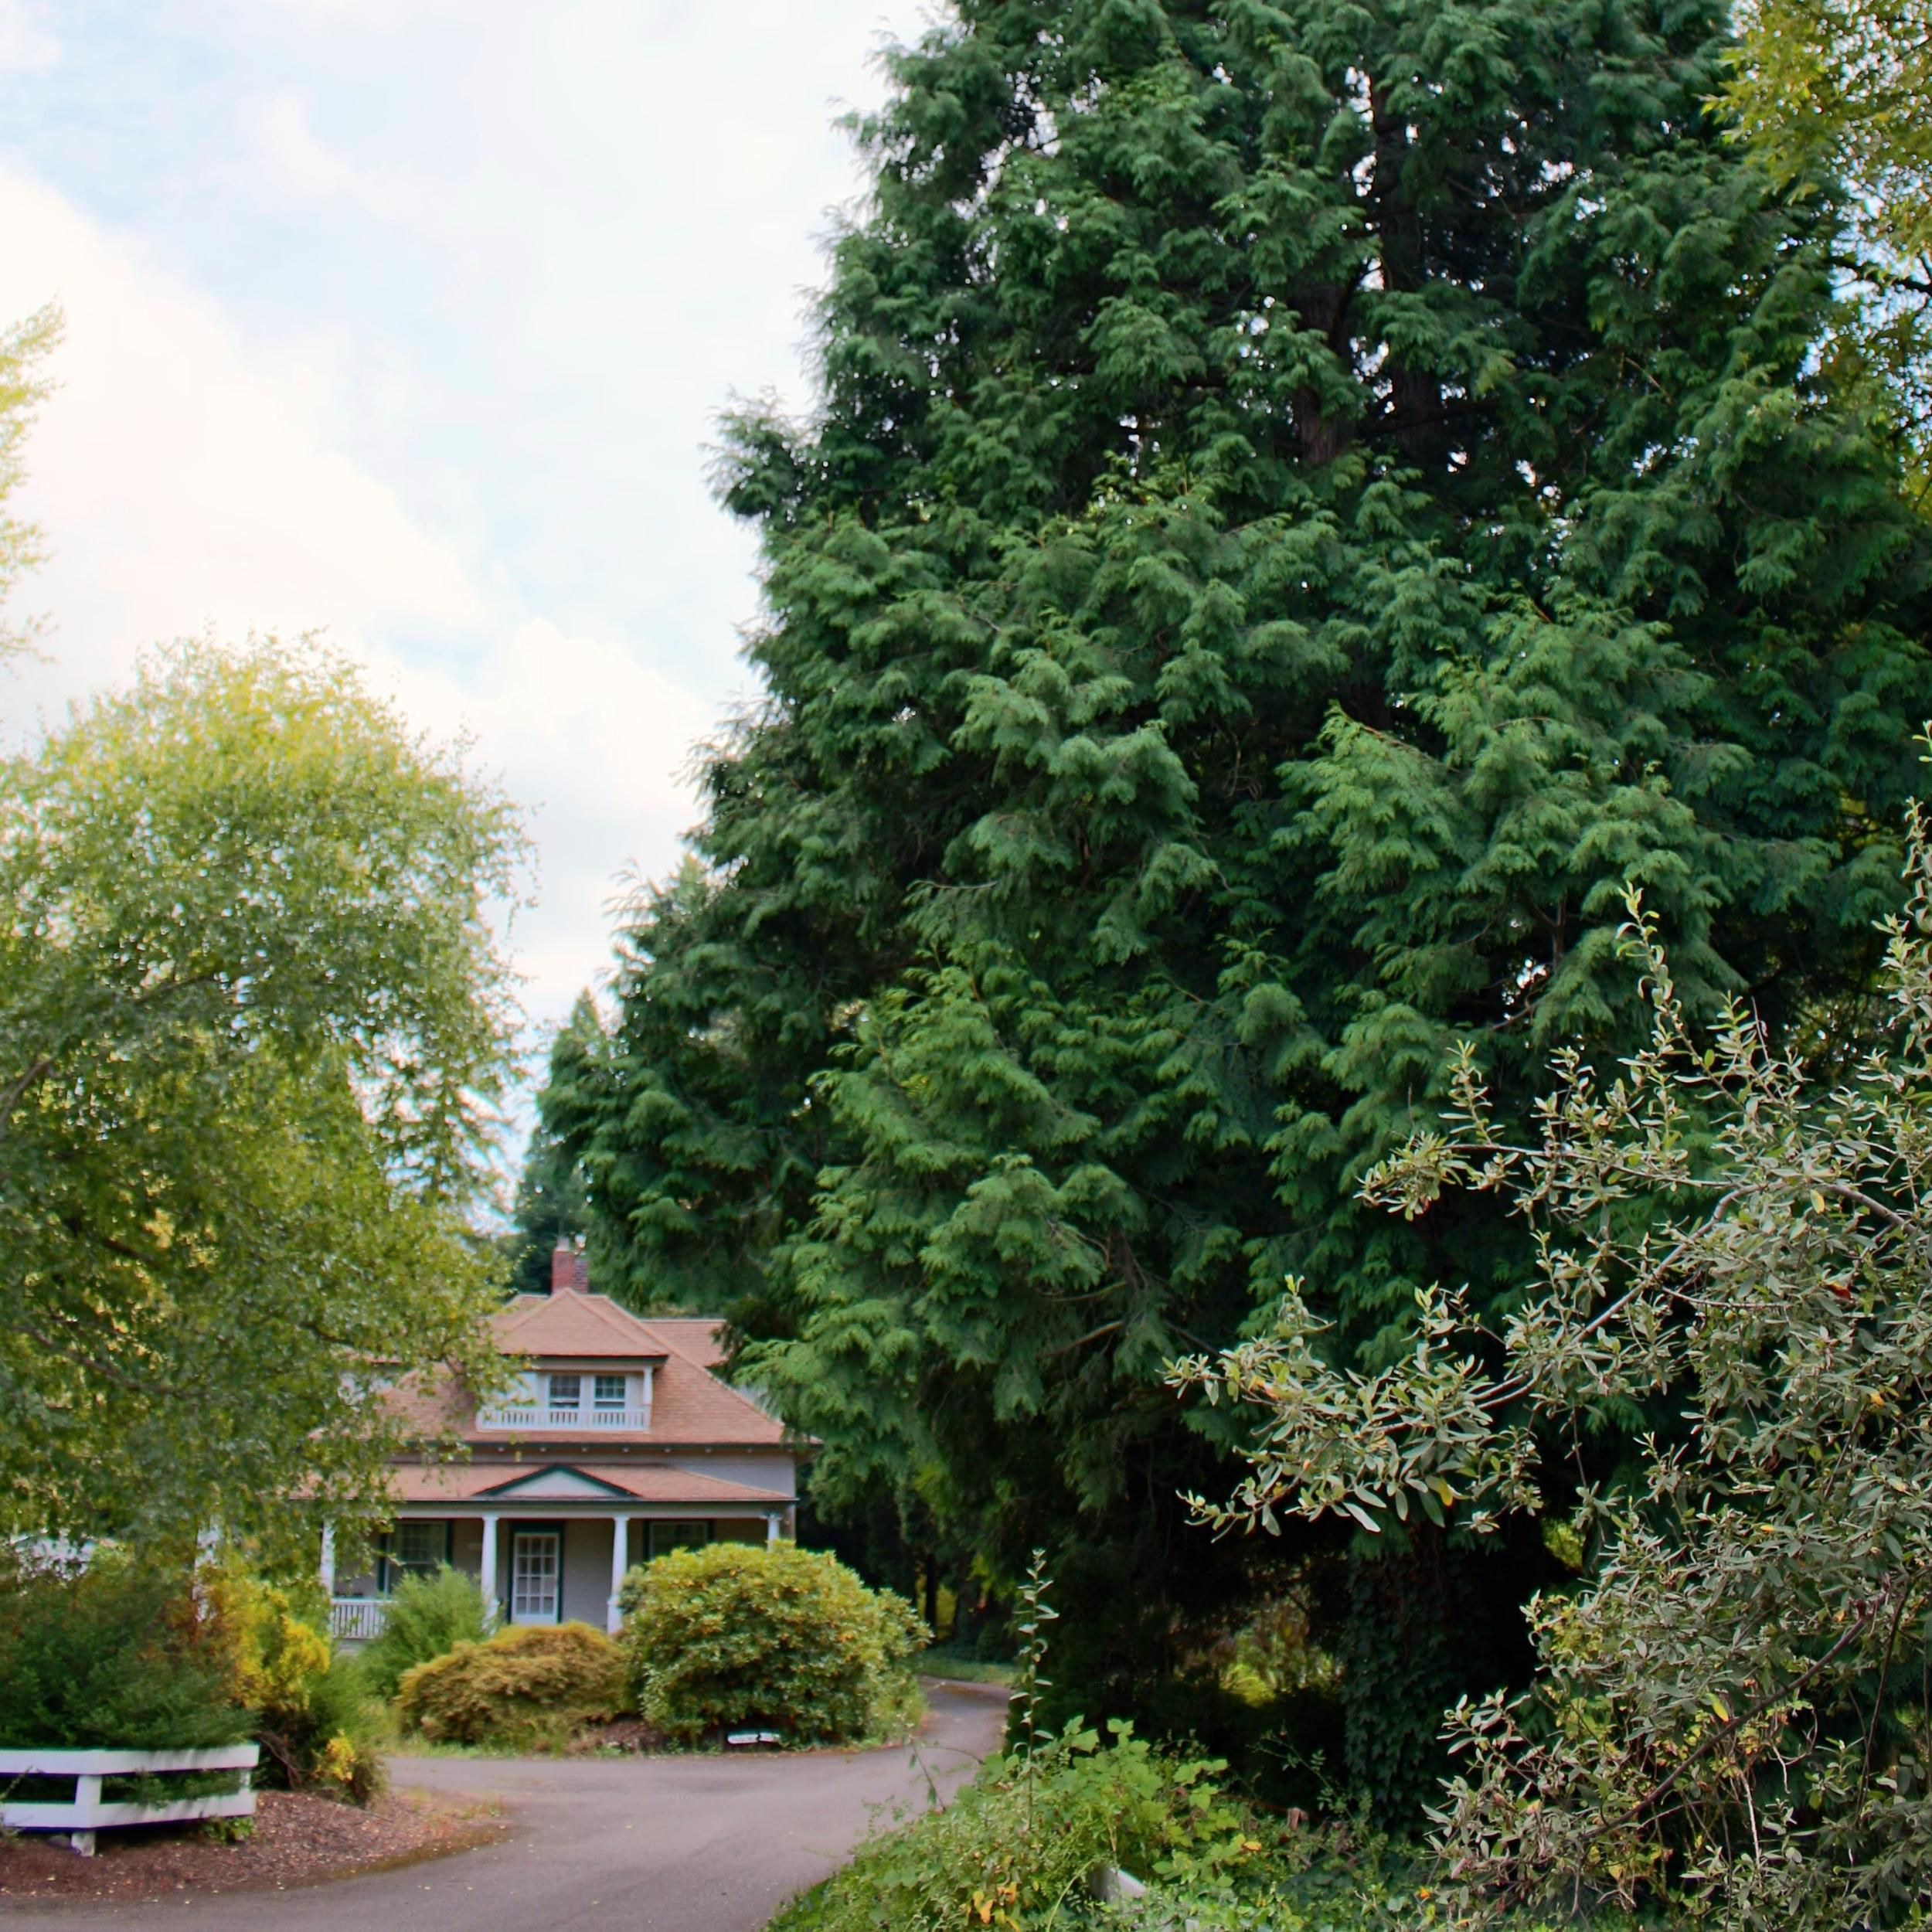 A vintage bungalow and a Hogan cedar near our home outside Portland, Oregon